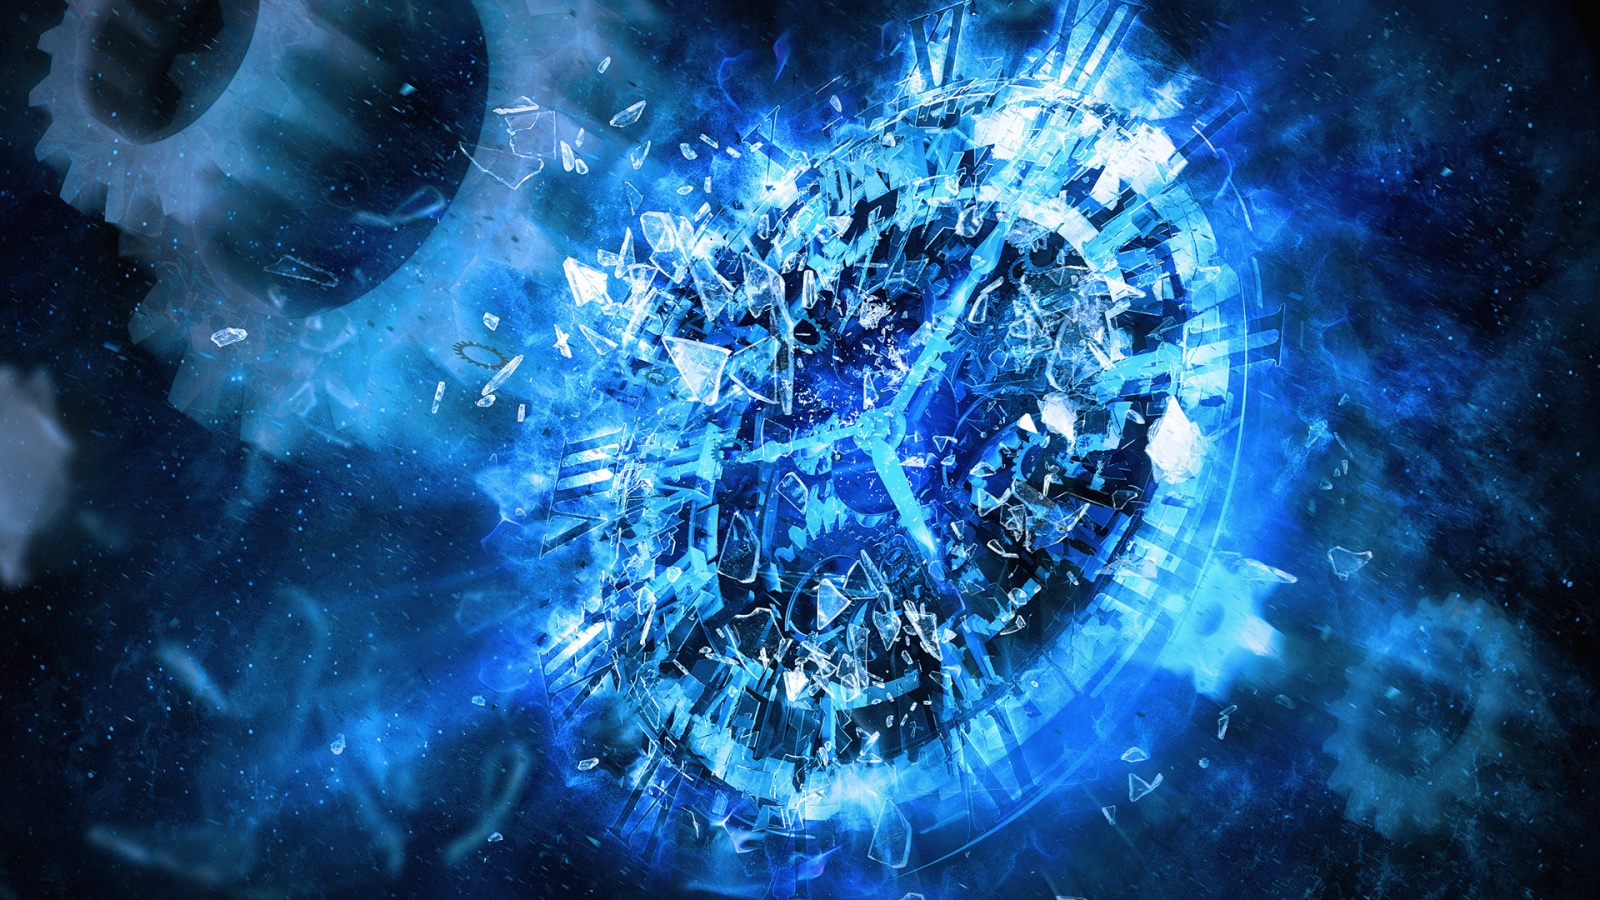 Super Cool Desktop Backgrounds Posted By John Mercado